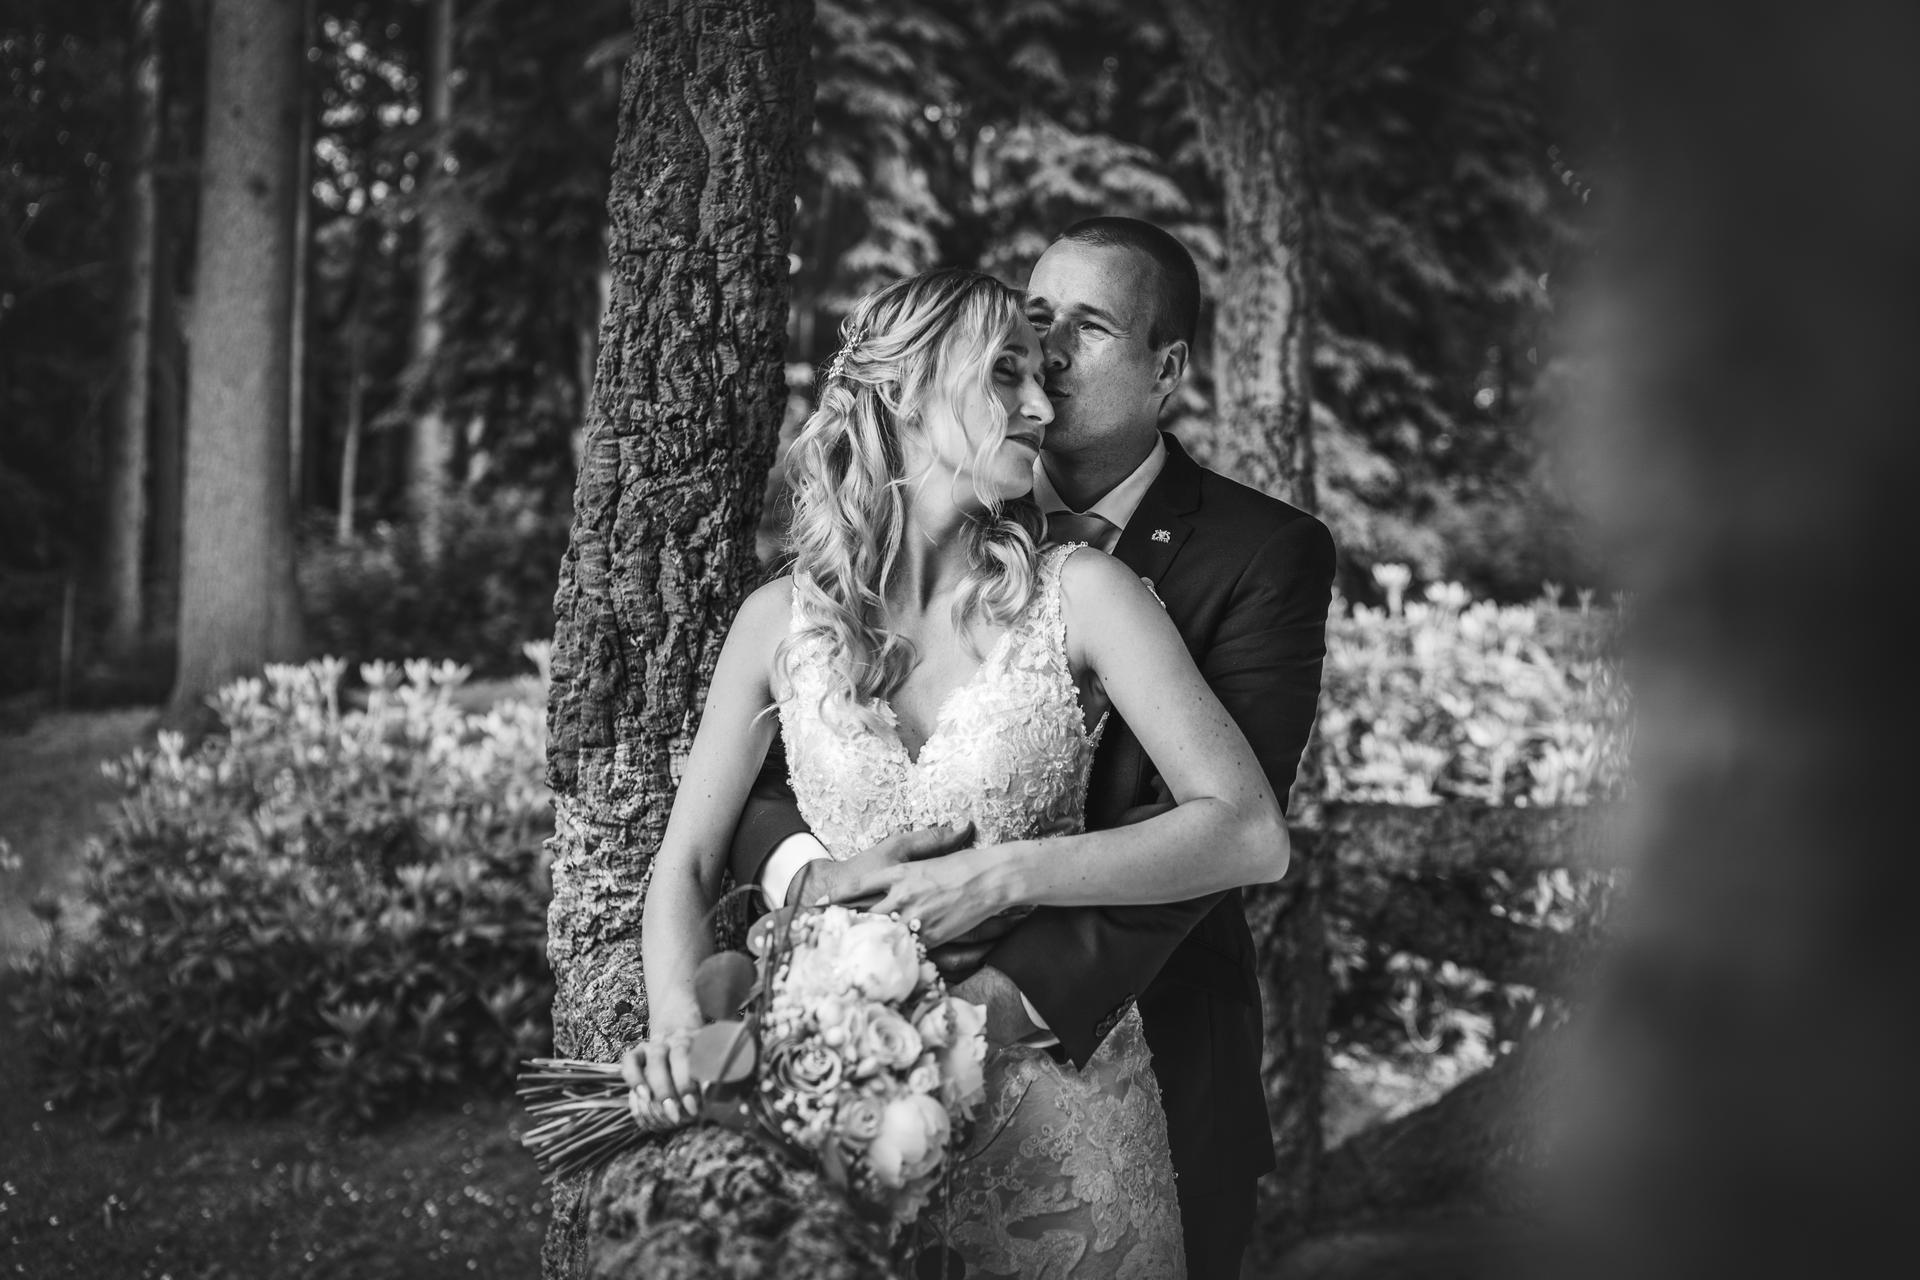 Naše svatba - Obrázek č. 6